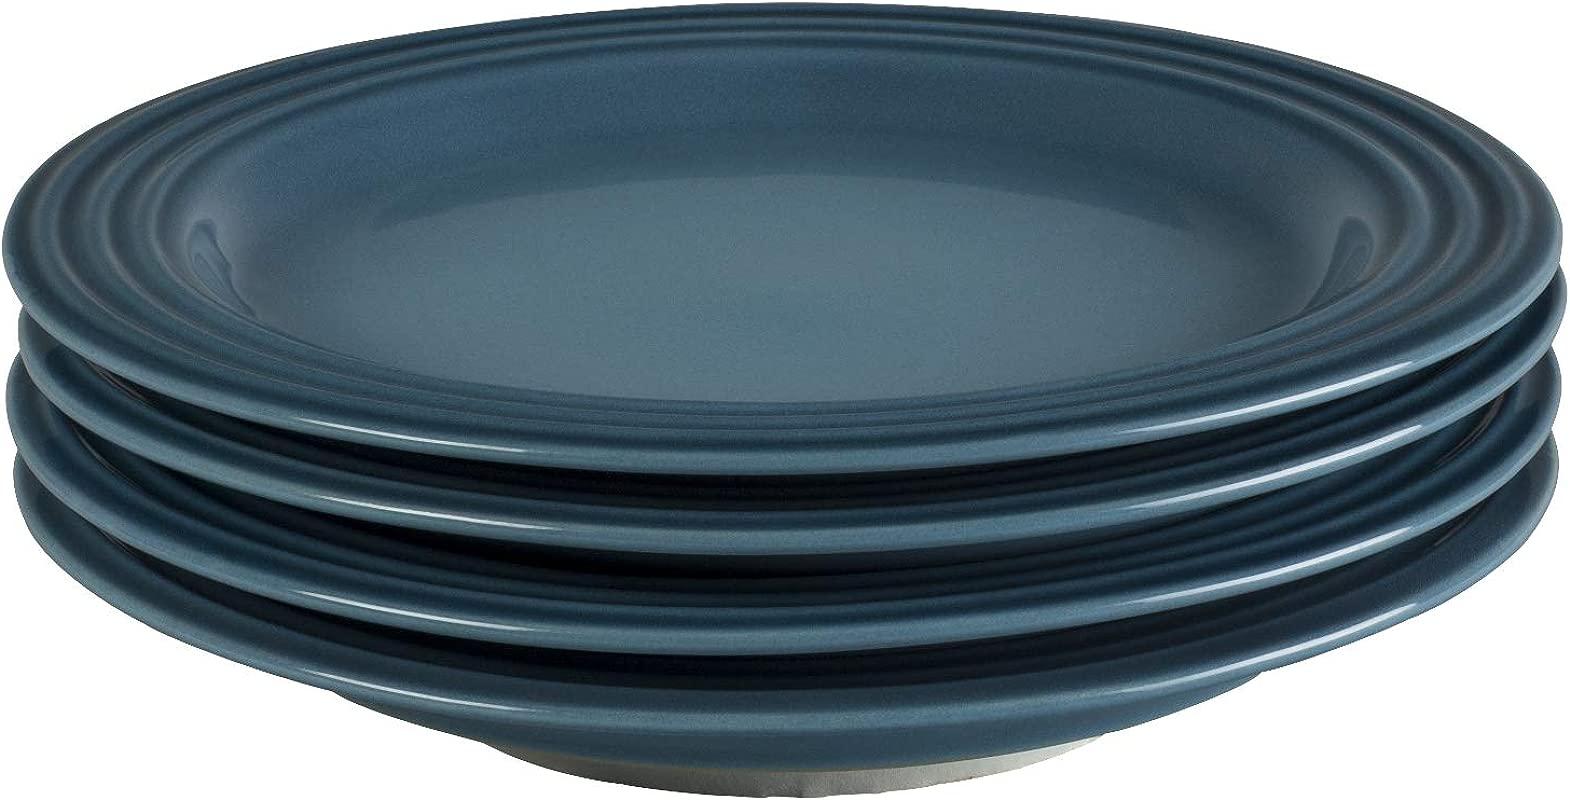 Le Creuset Of America PG9300S4 226M Salad Plates Set Of 4 8 5 Marine